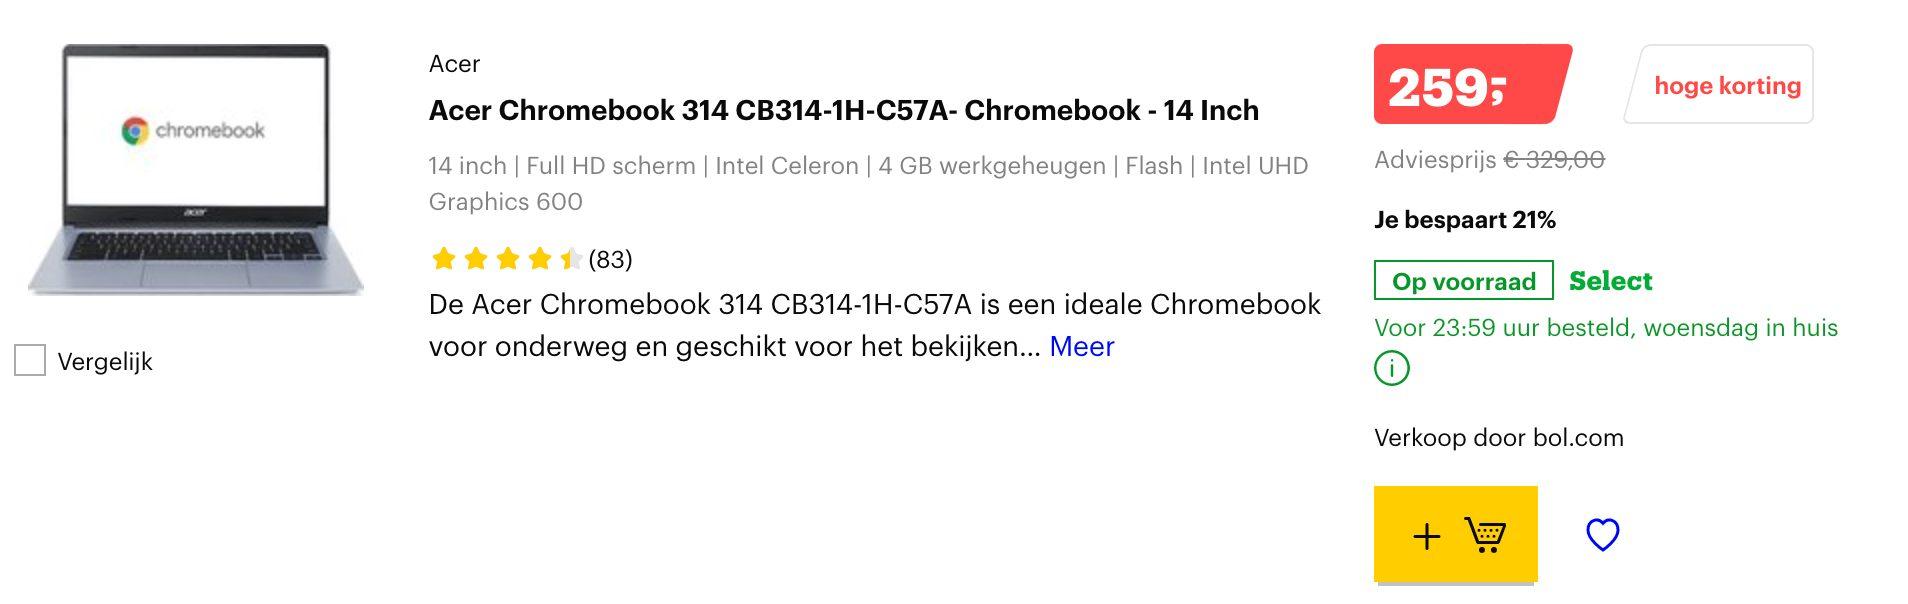 Acer Chromebook 314 CB314-1H-C57A aanbieding